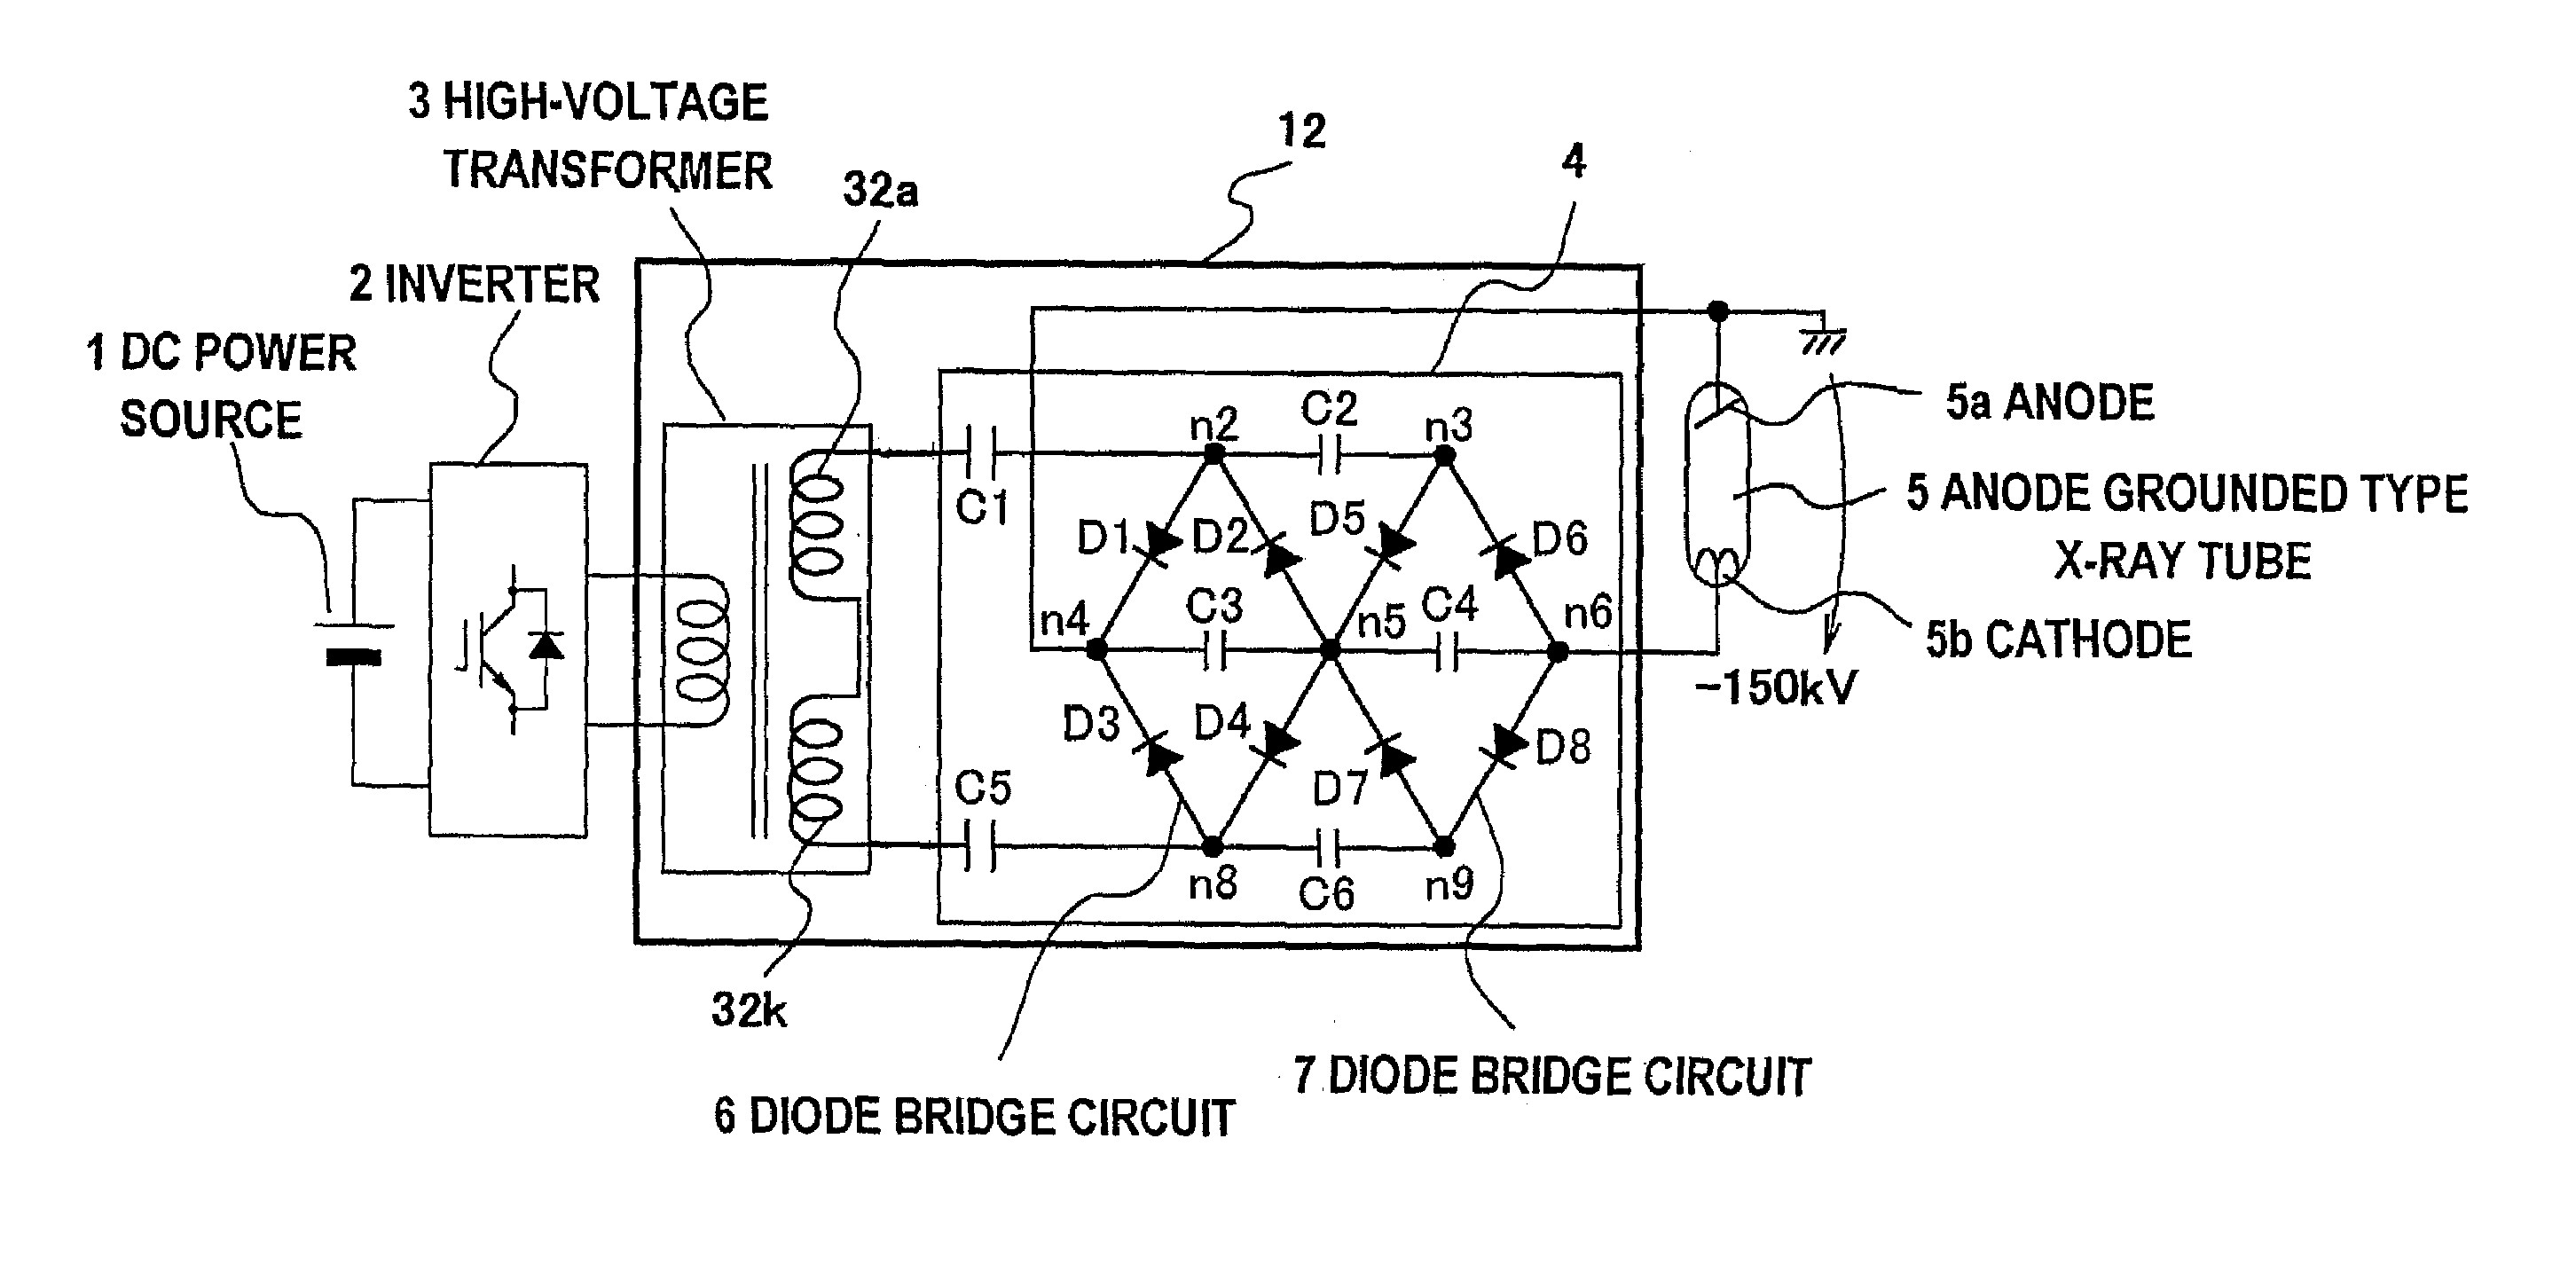 high voltage circuit diagram polaris predator 90 wiring generator image